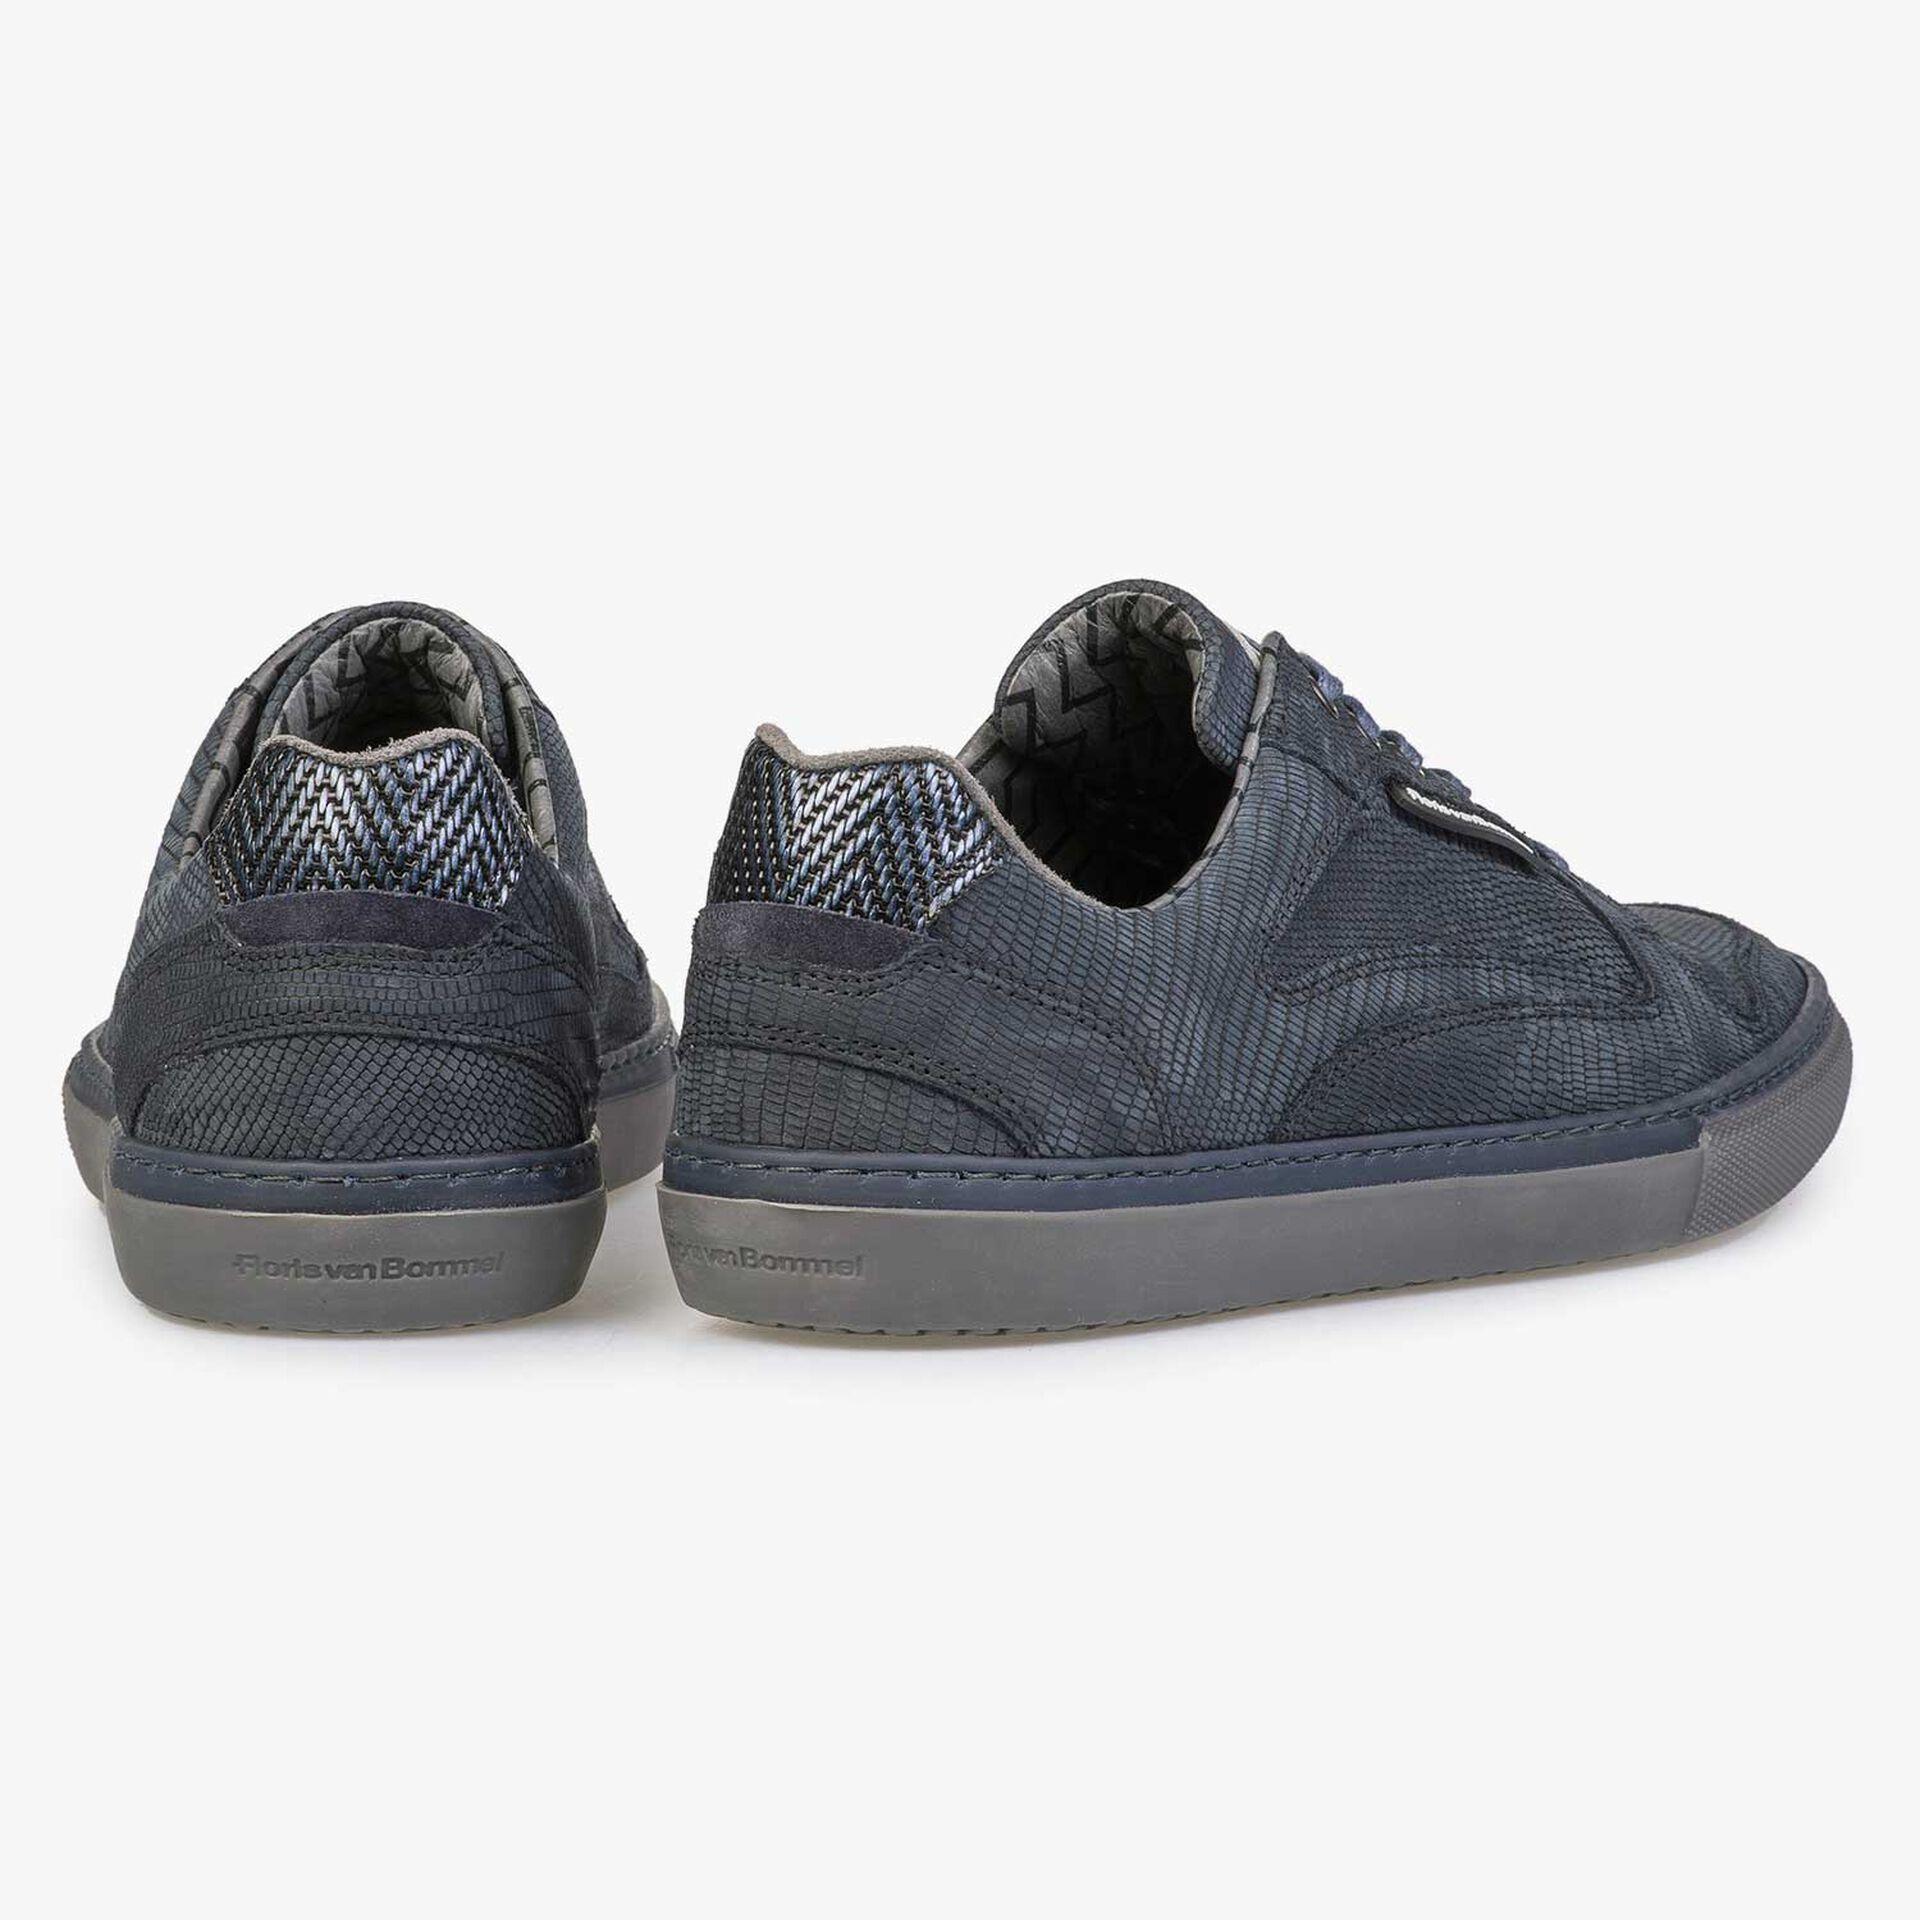 Blue lizard print nubuck leather sneaker